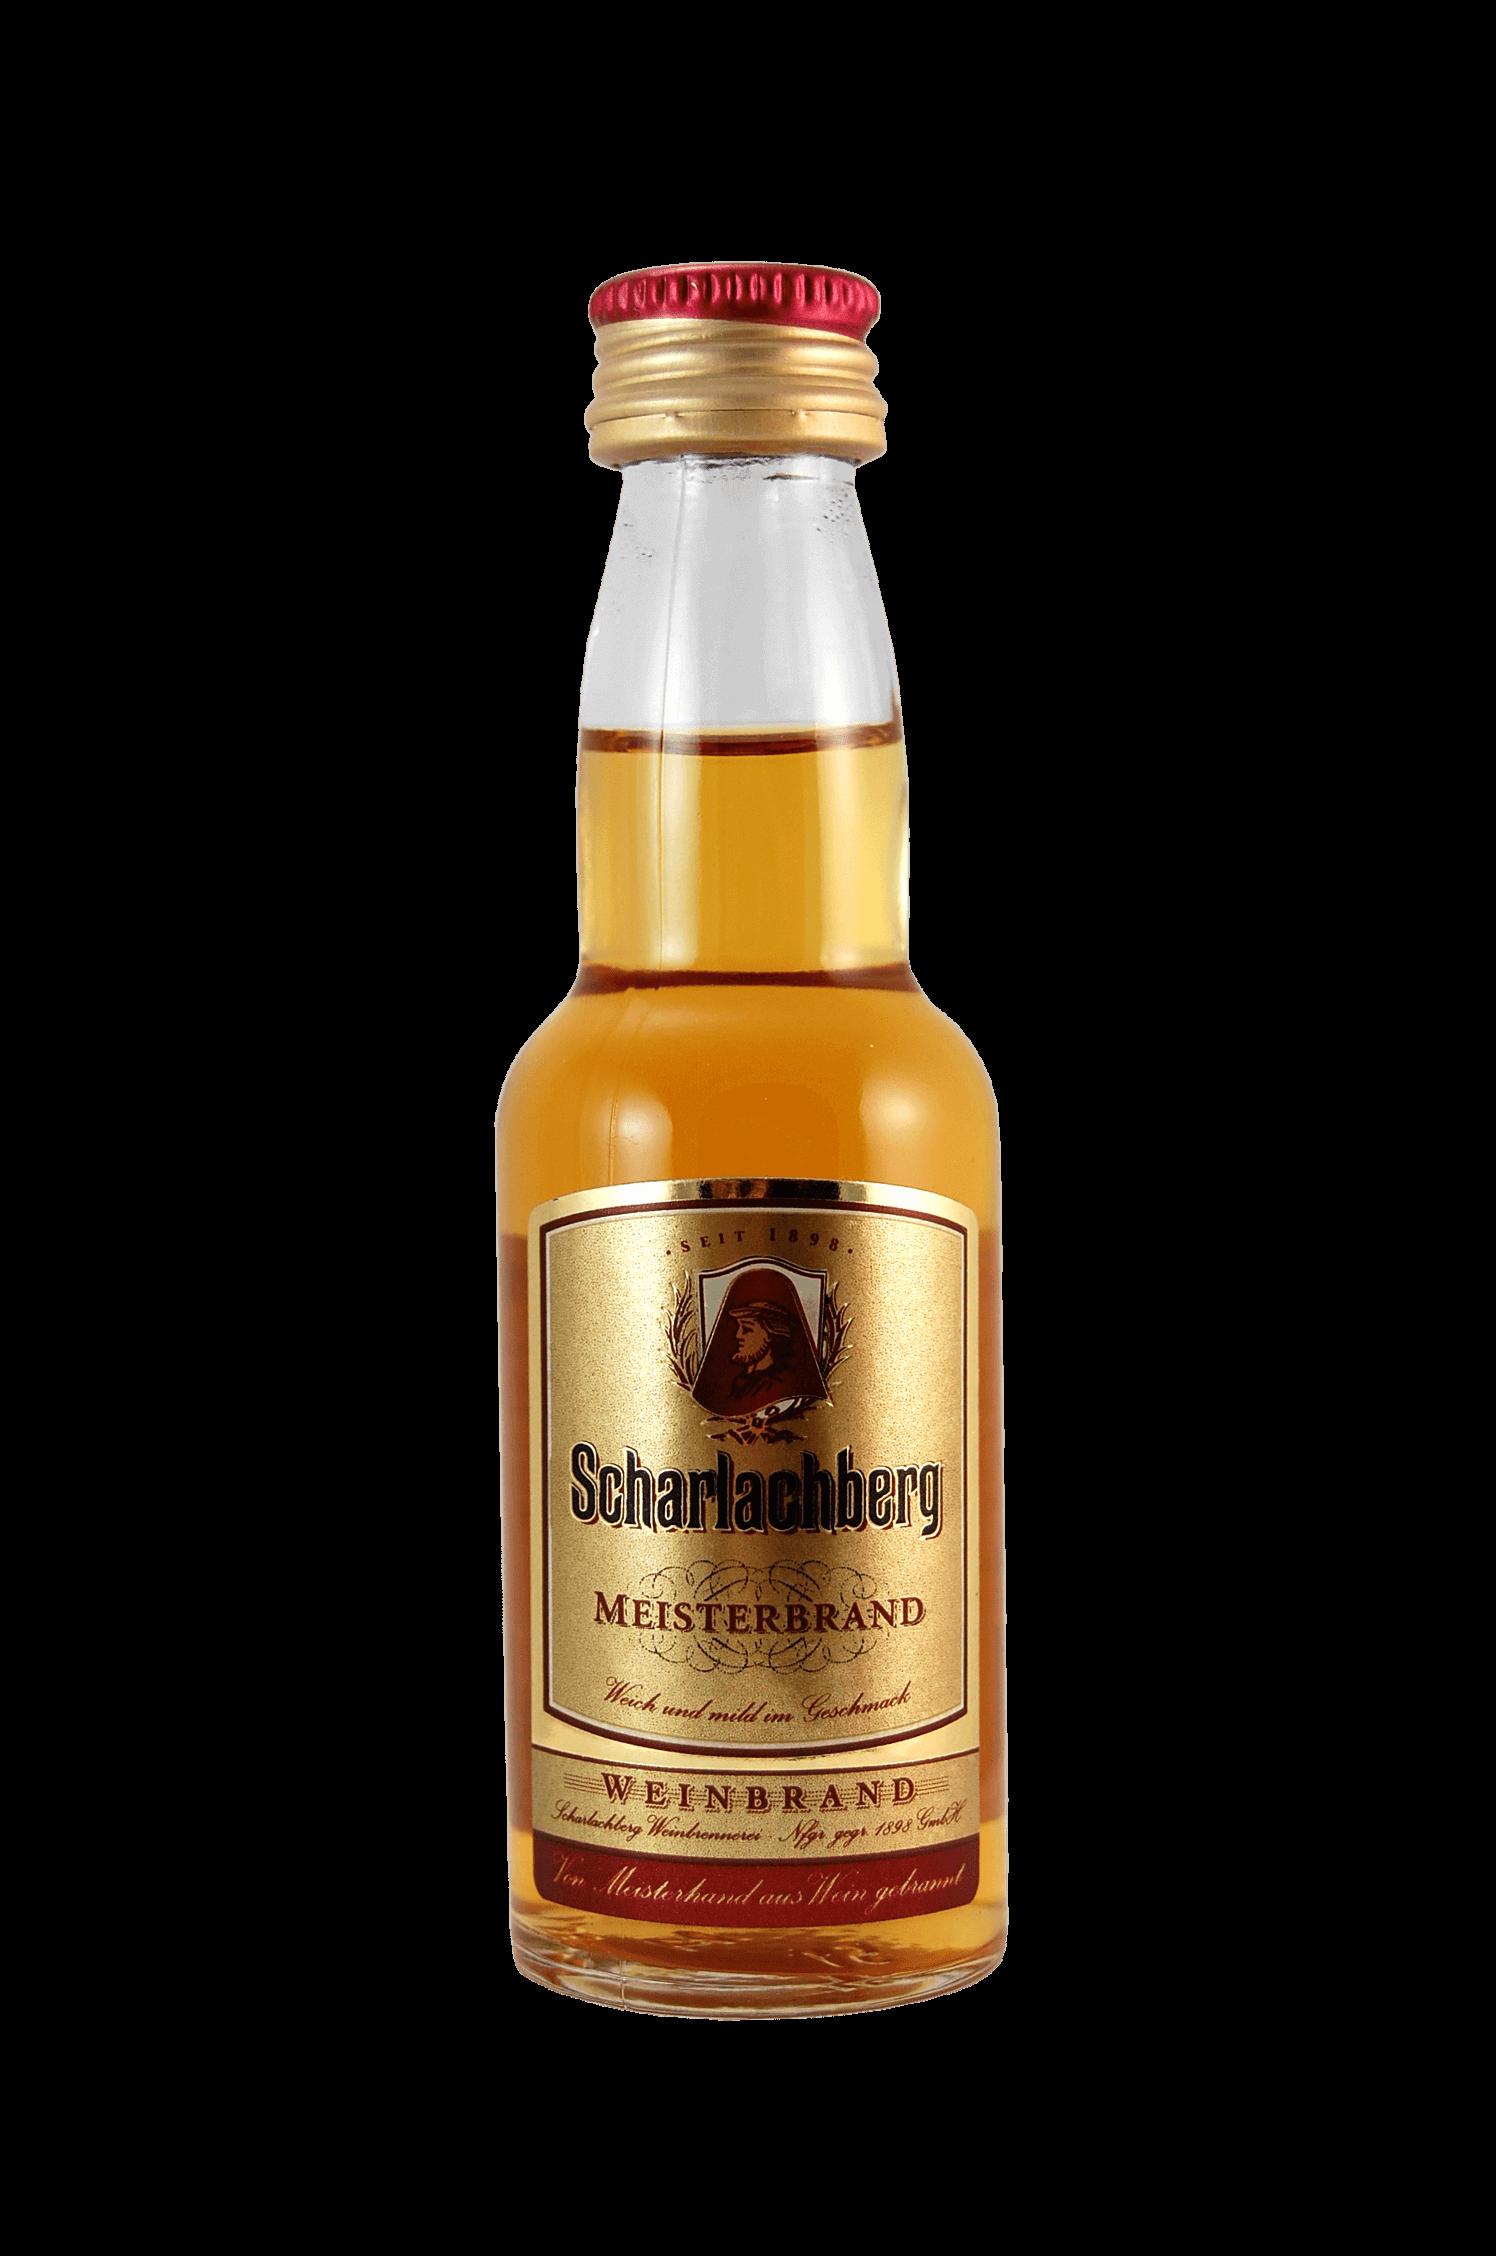 Scharlachberg Meisterbrand